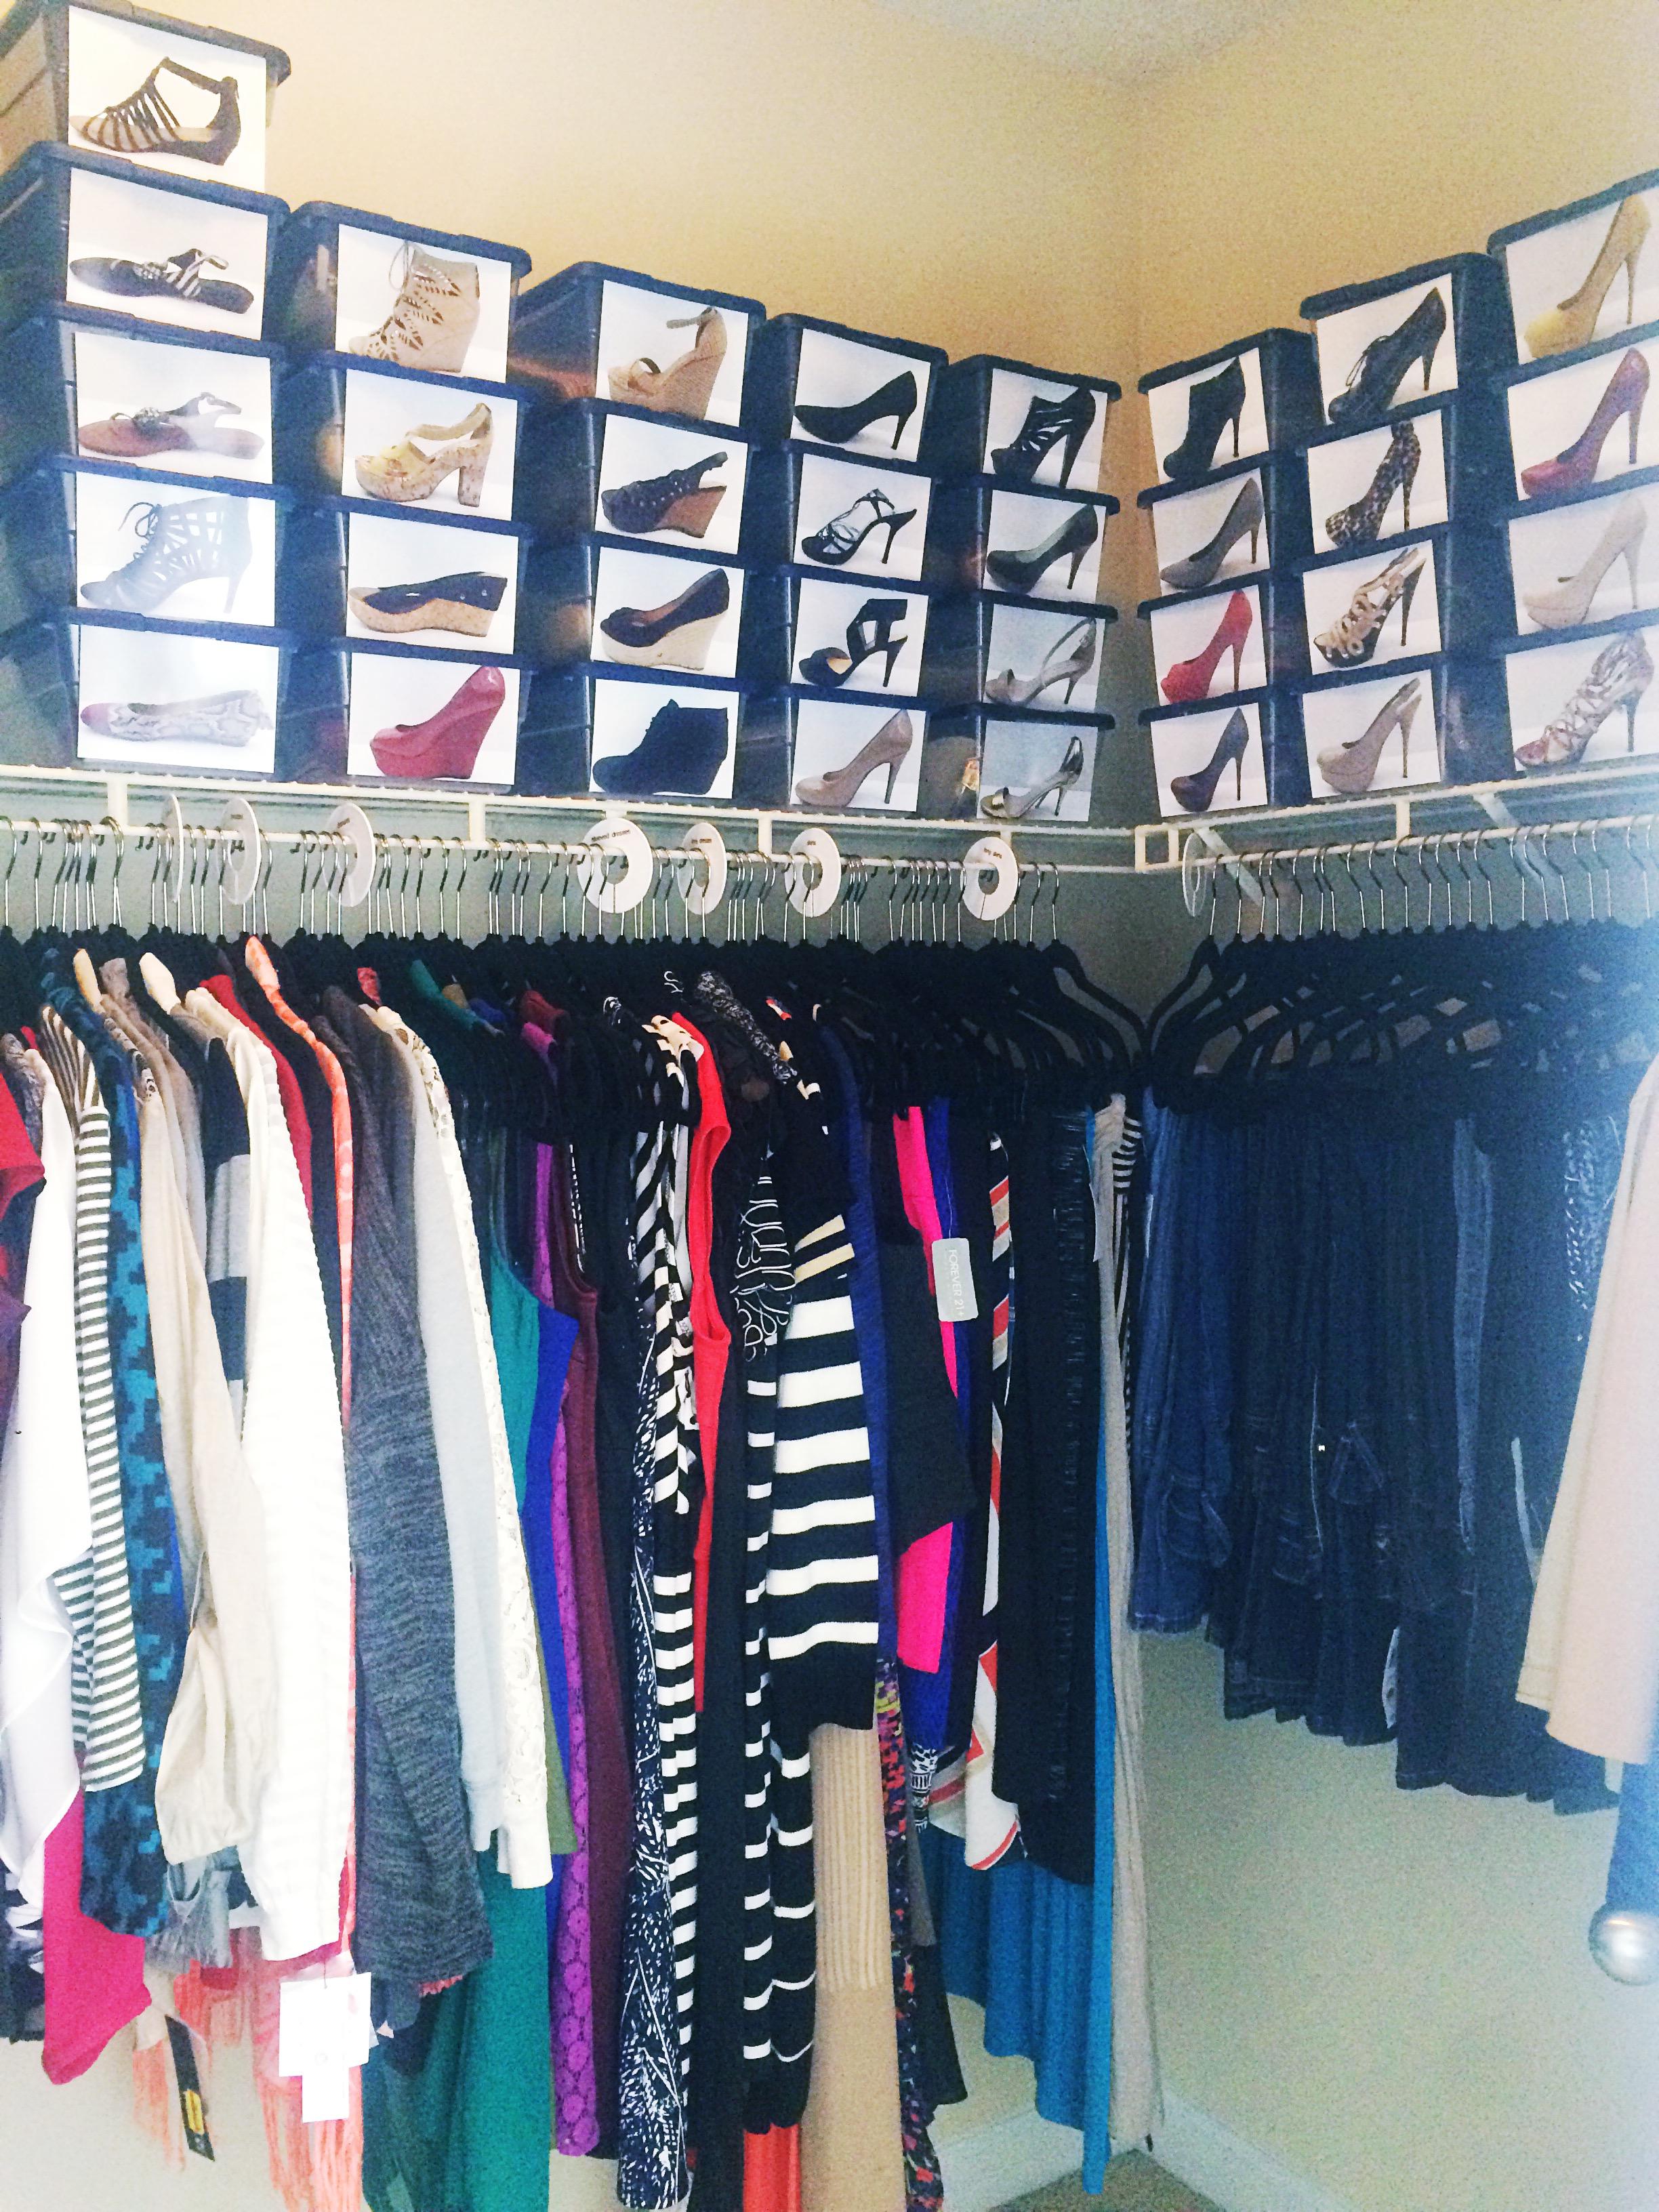 yr themodule an organized ways your can blogs life closet modular system improve